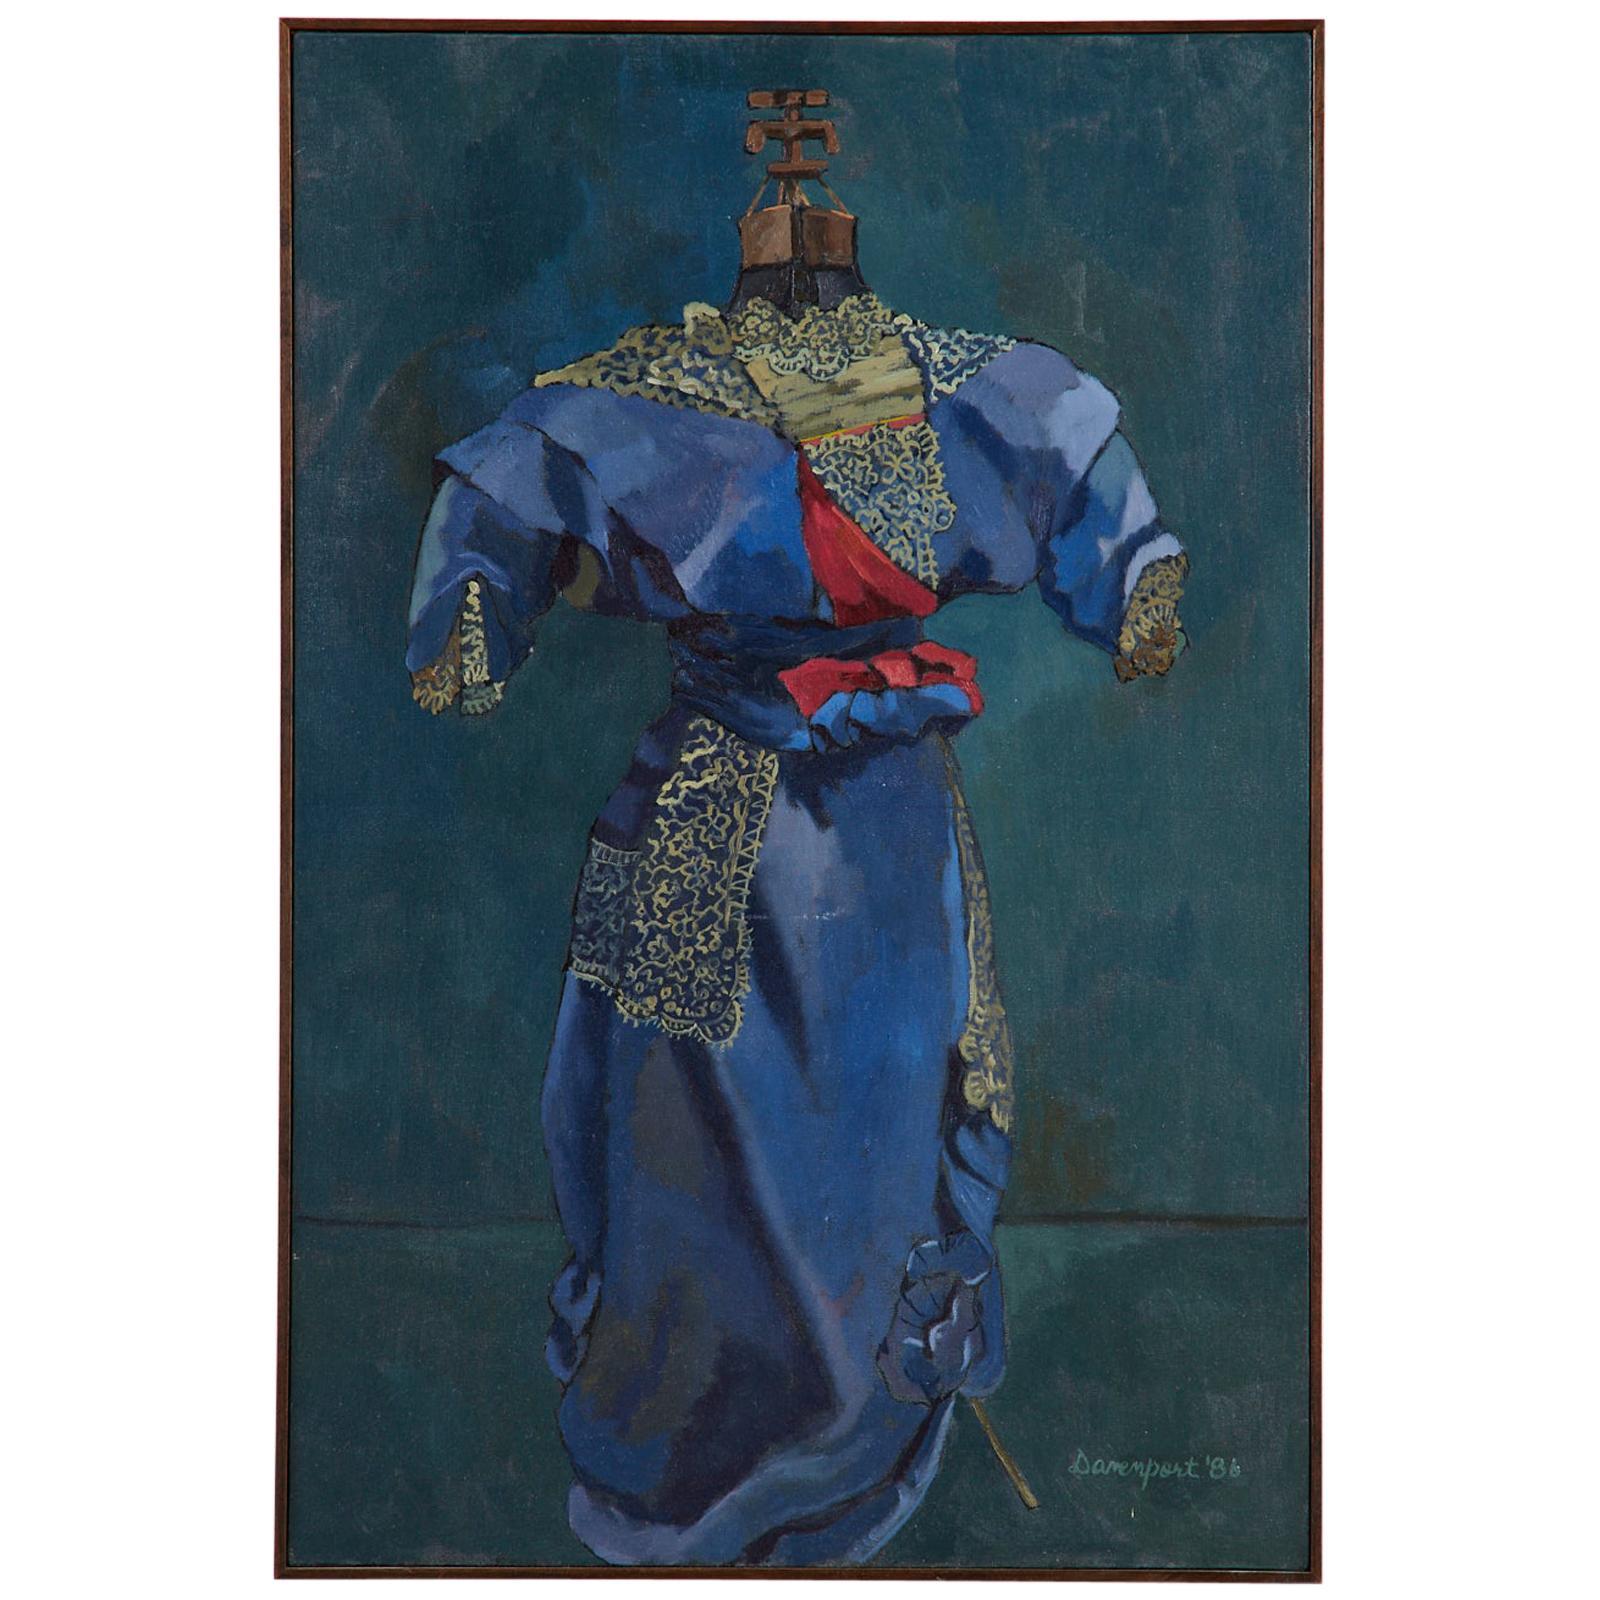 Coronation by Jill Davenport Oil on Canvas, 1986